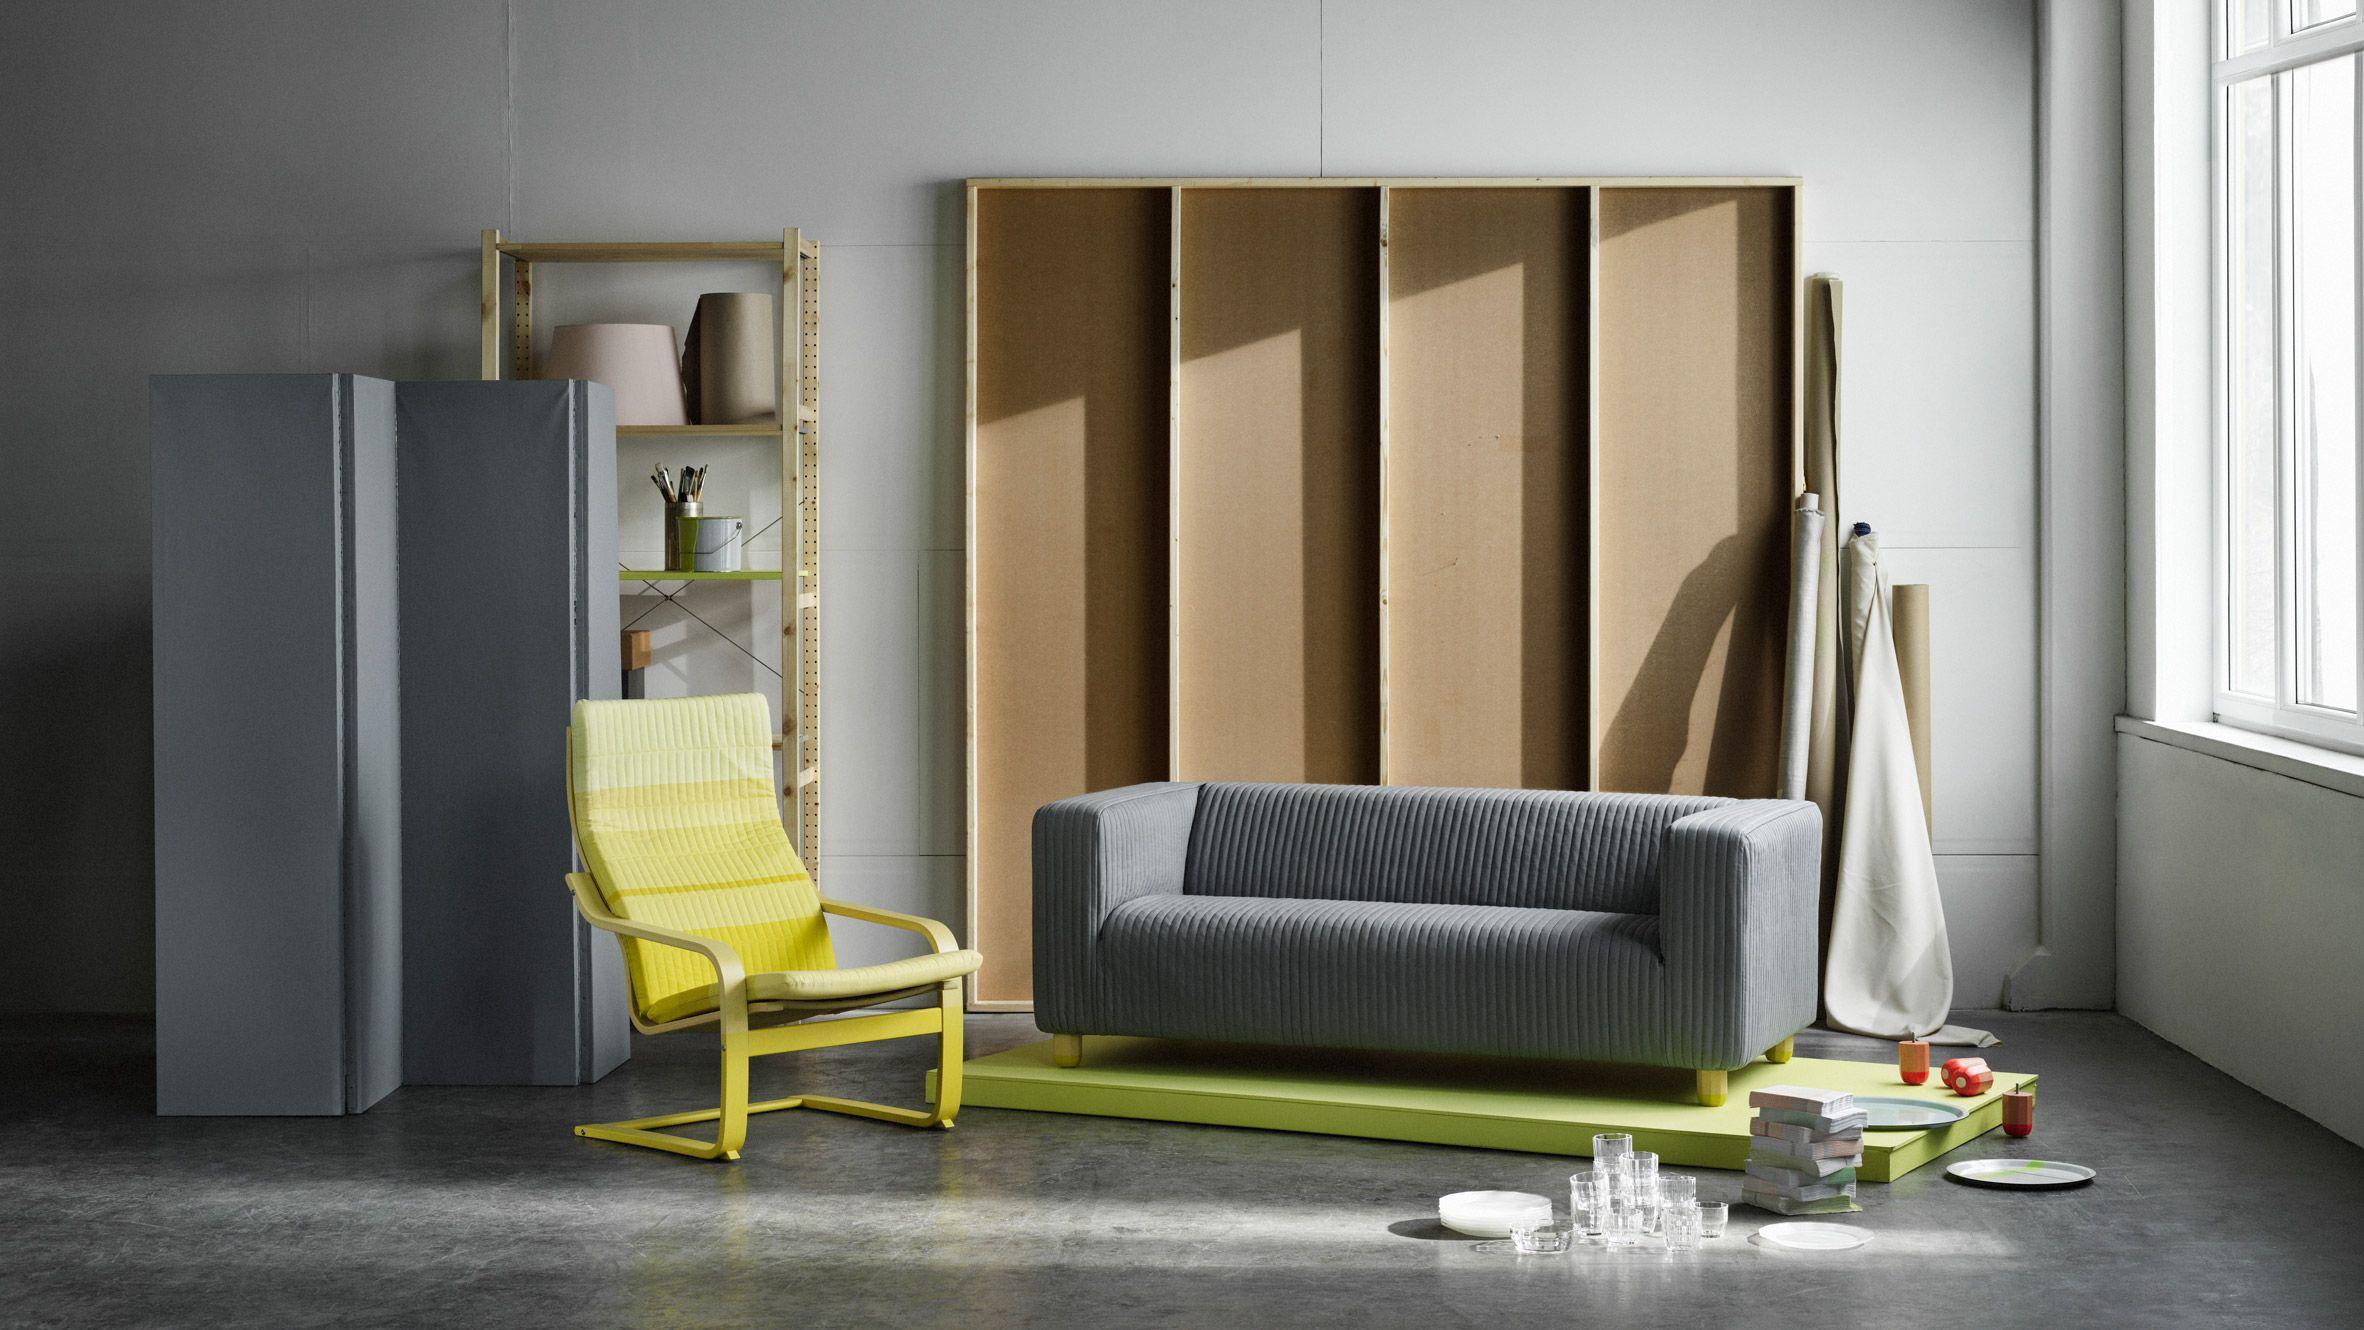 Gambe Per Mobili Ikea i mobili più famosi di ikea hackerati da scholten & baijings